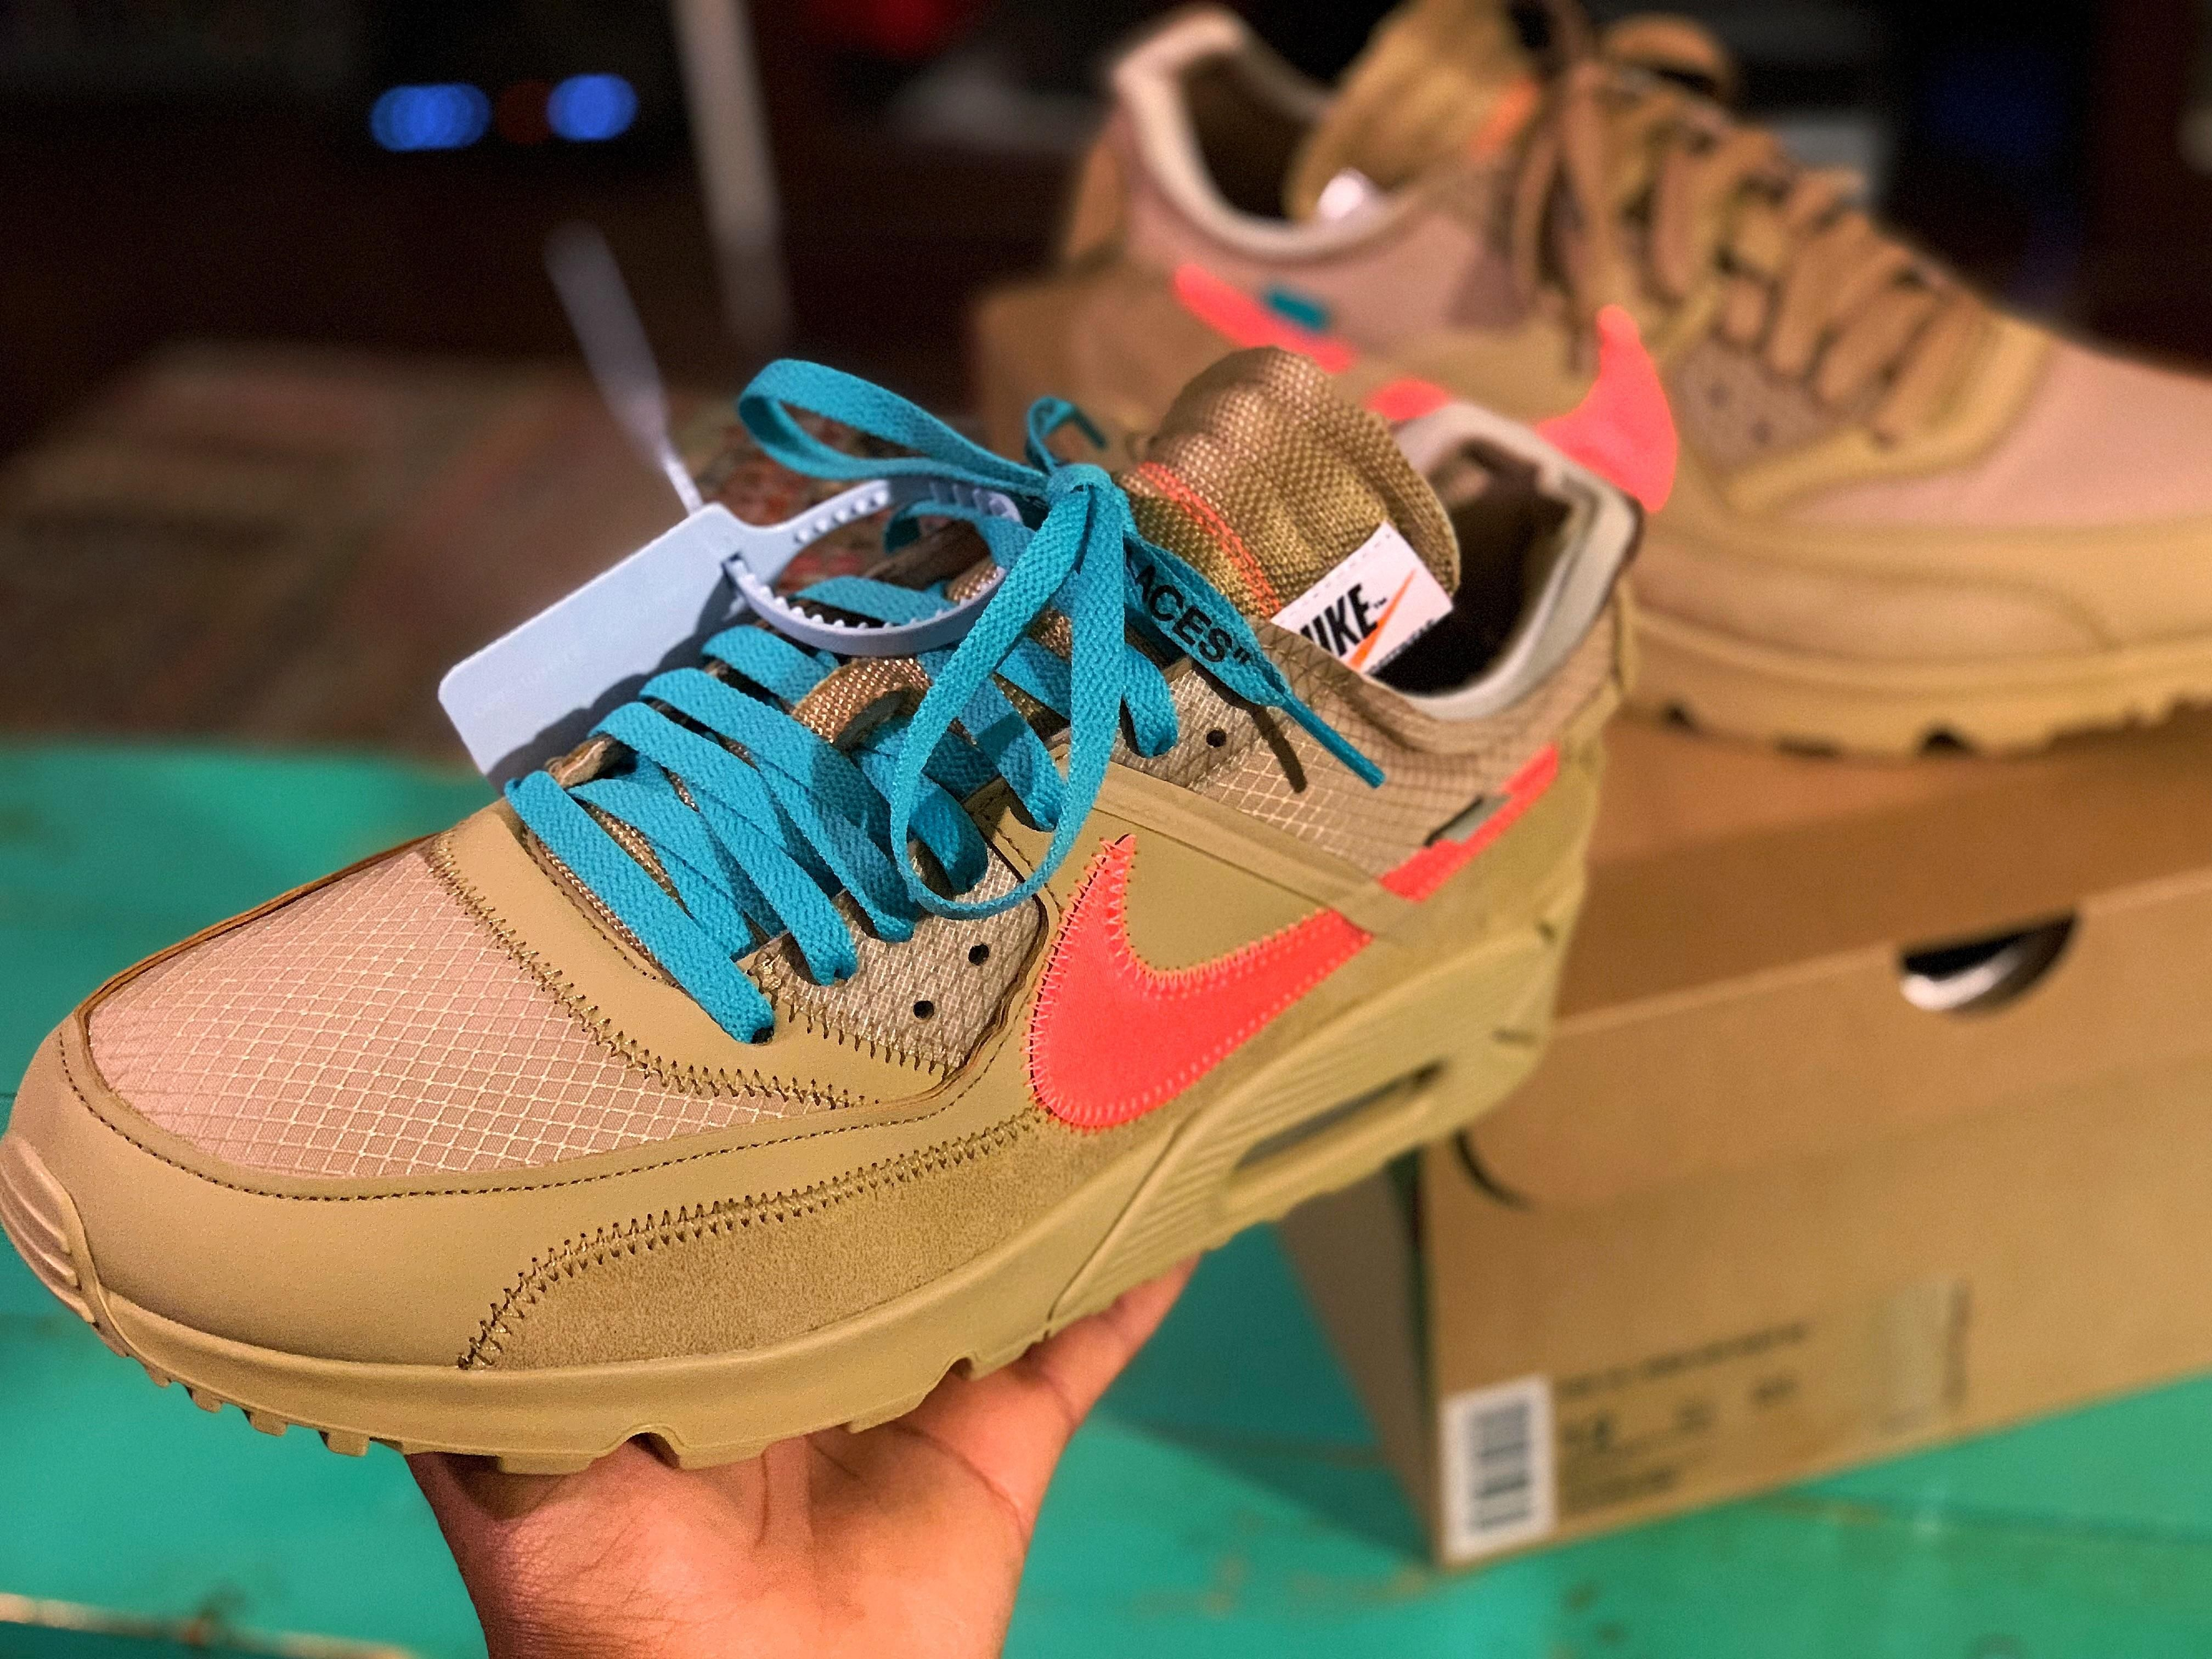 e99bab866be9b Pickup] Mandatory lace swap | Sneakers | Sneakers nike, Sneakers ...